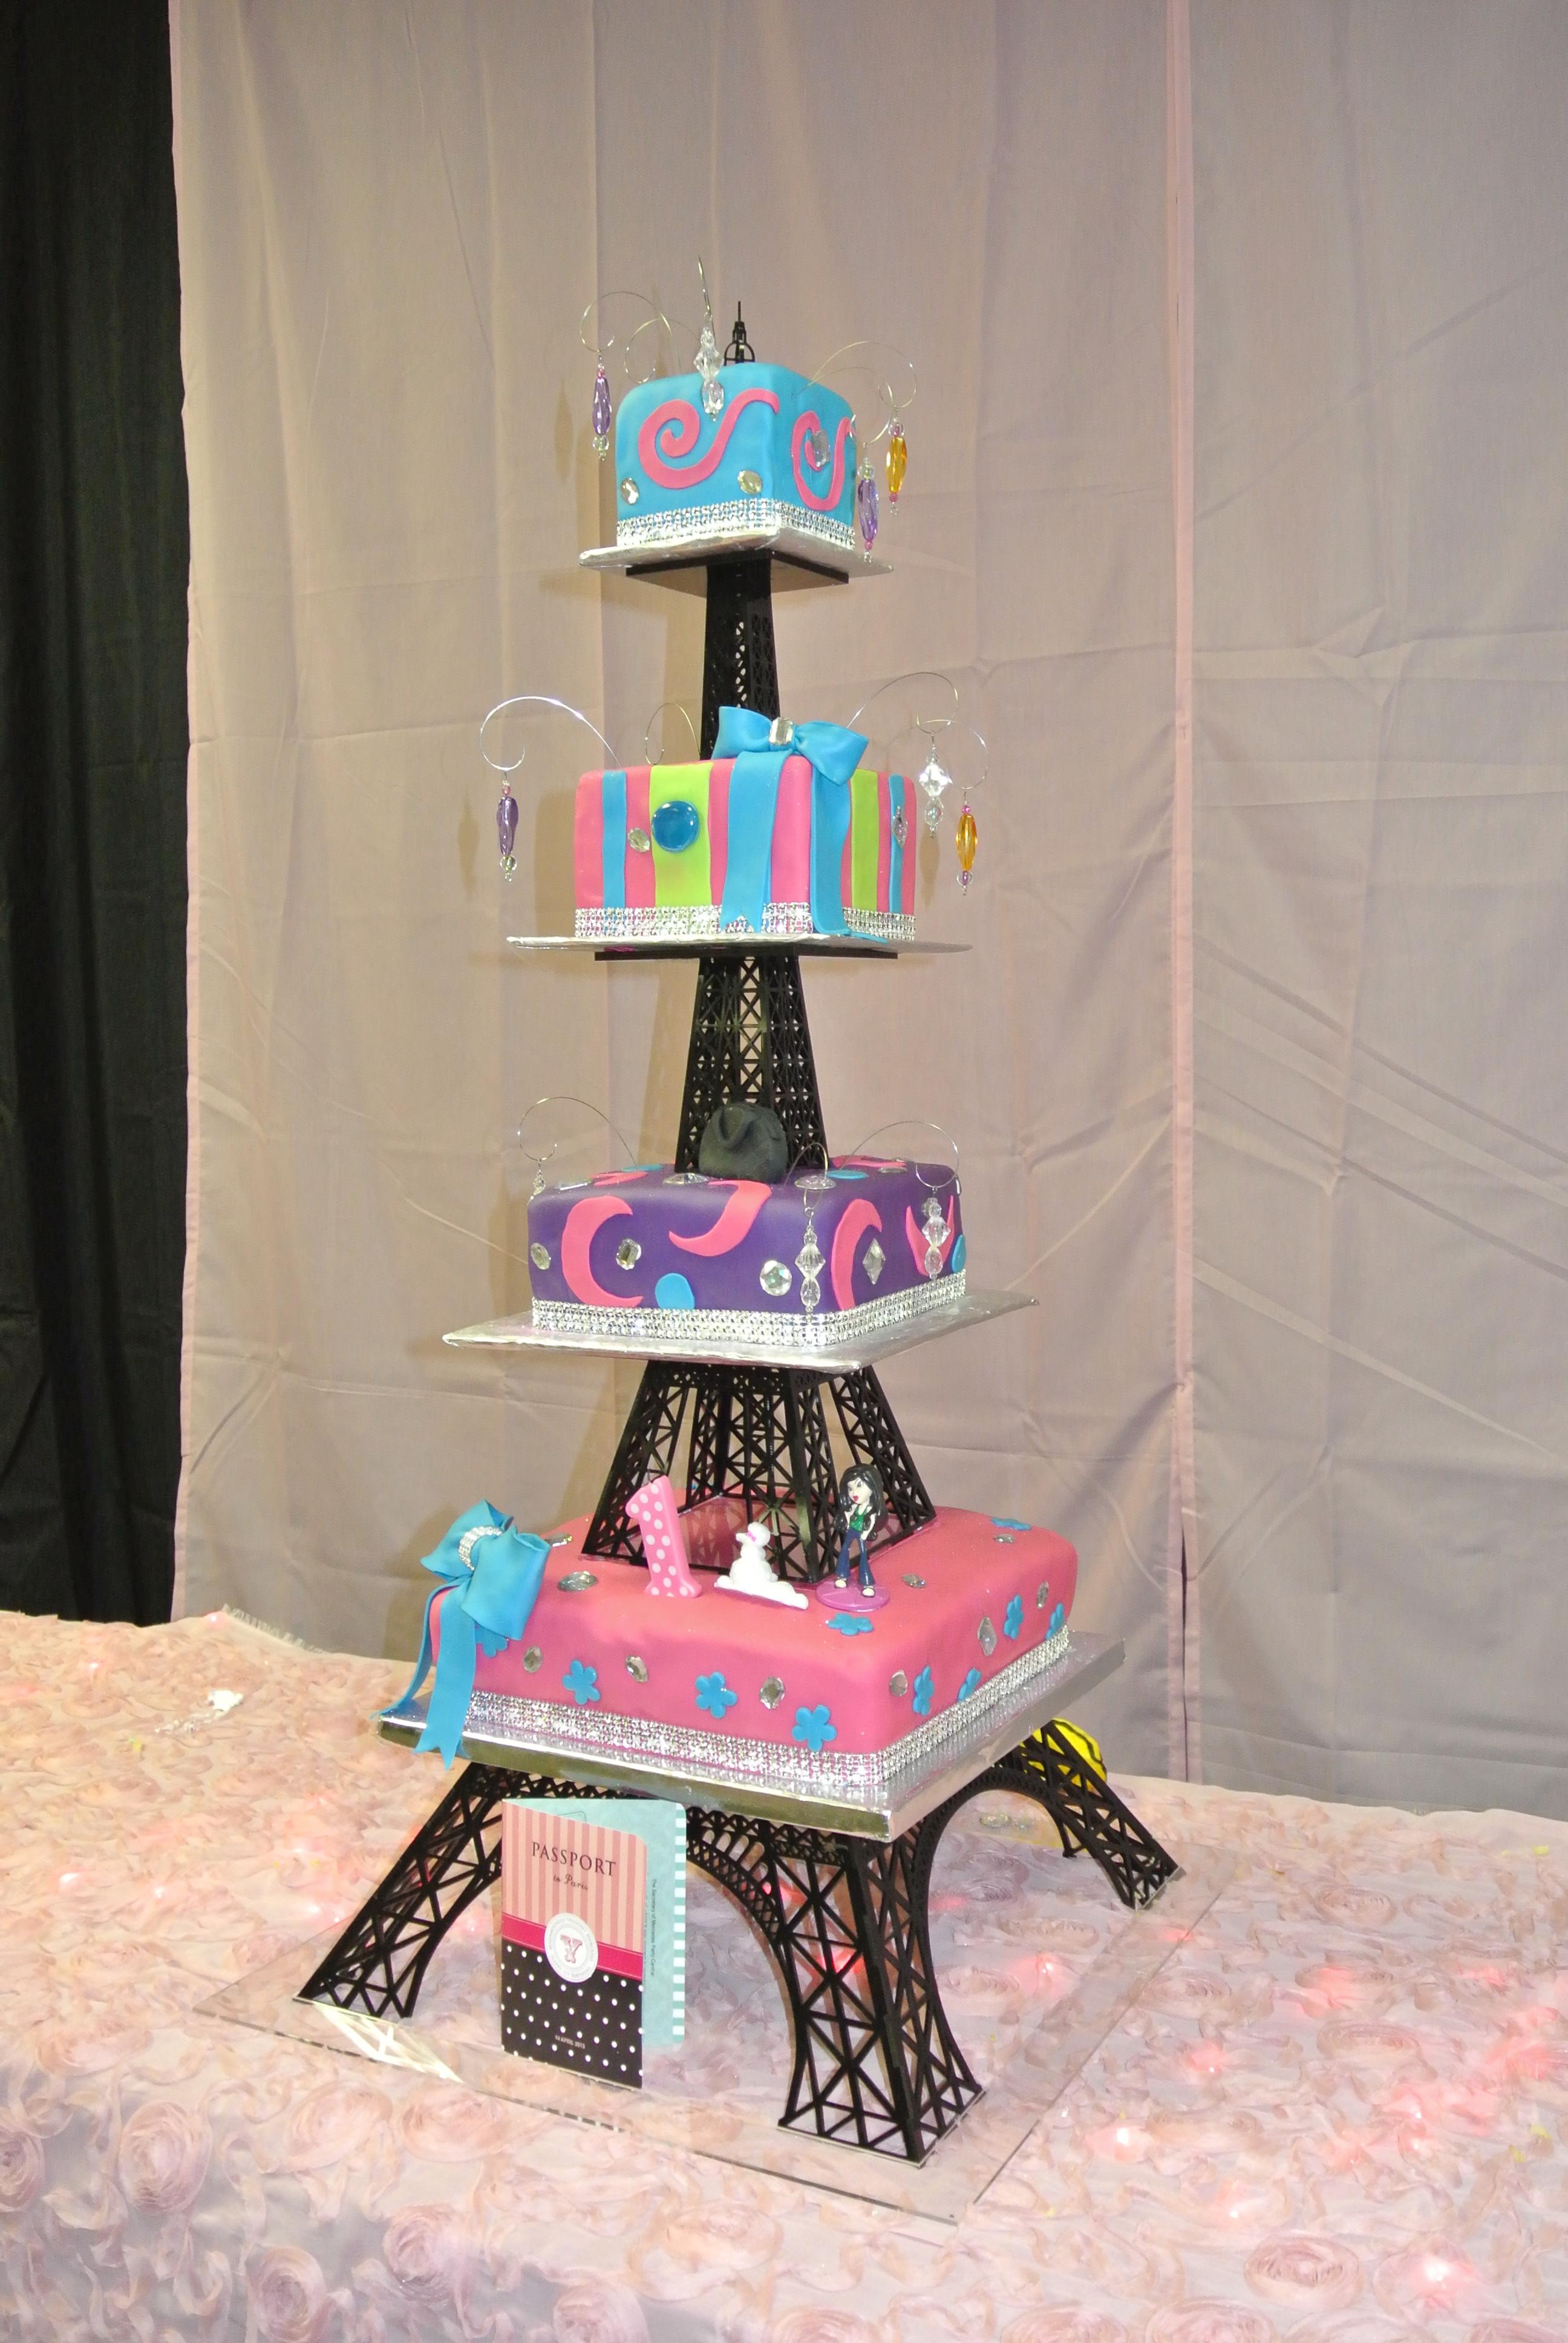 Miraculous Eiffel Tower Cakes Decoration Ideas Little Birthday Cakes Funny Birthday Cards Online Aeocydamsfinfo